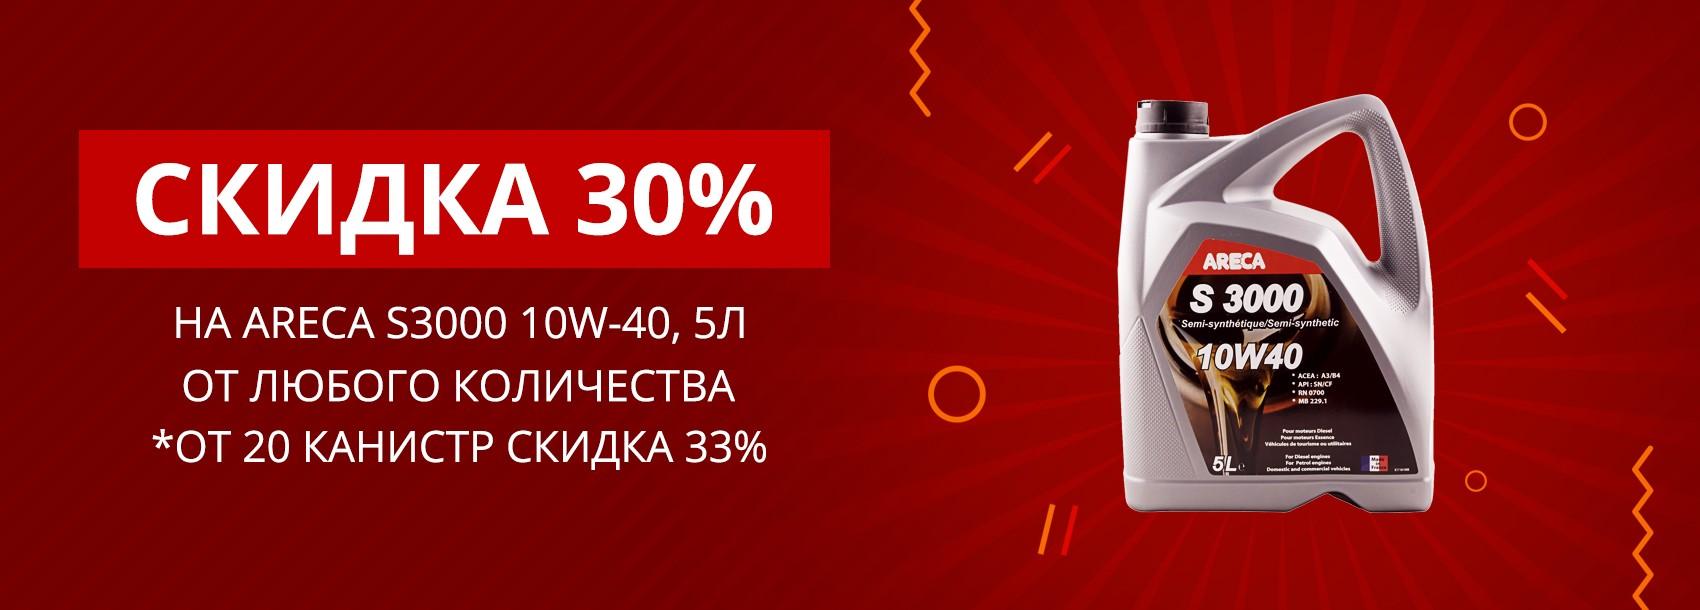 Скидка 30% на моторное масла Areca S3000